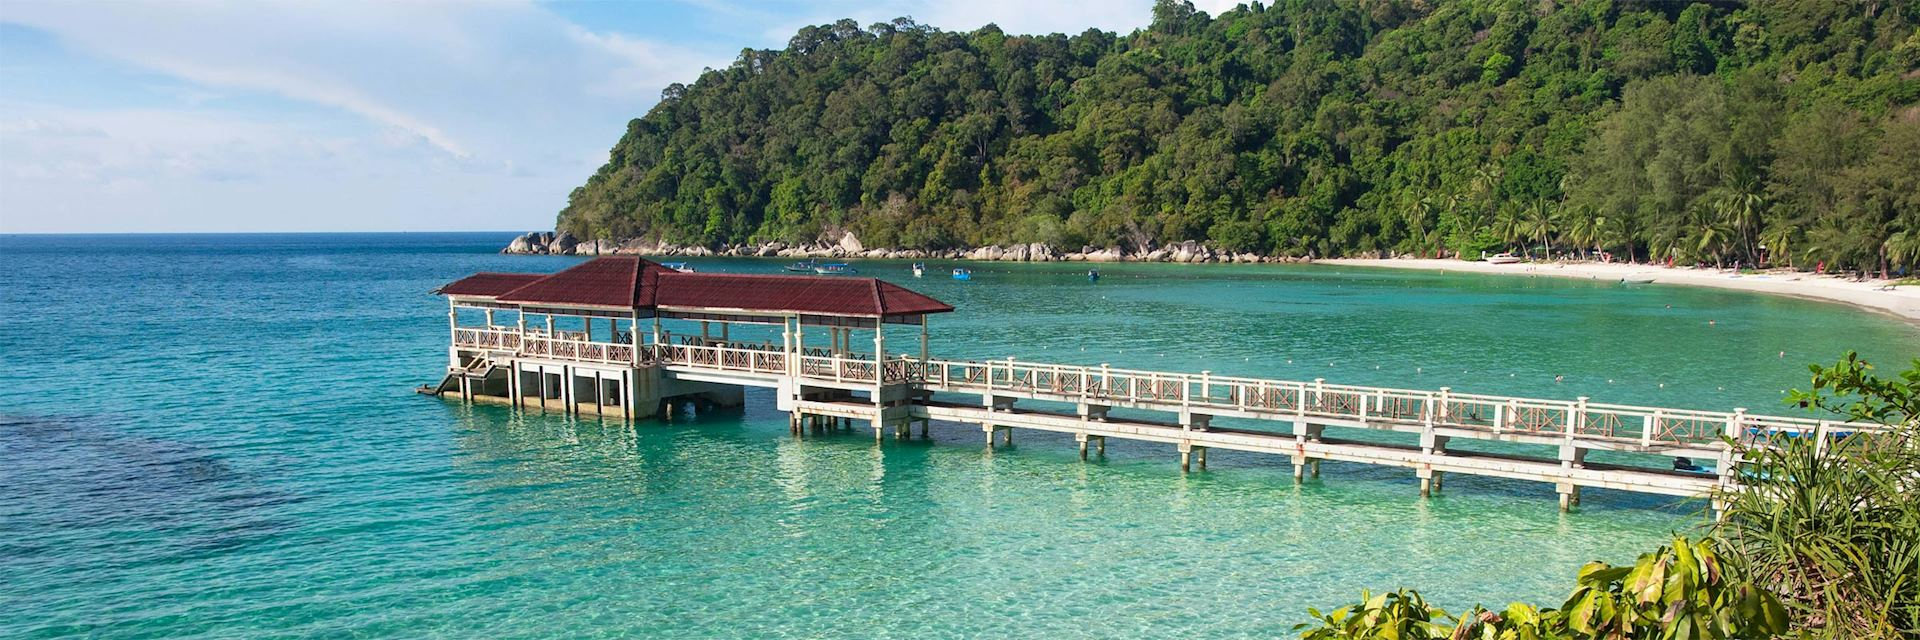 Perhentian Besar Island